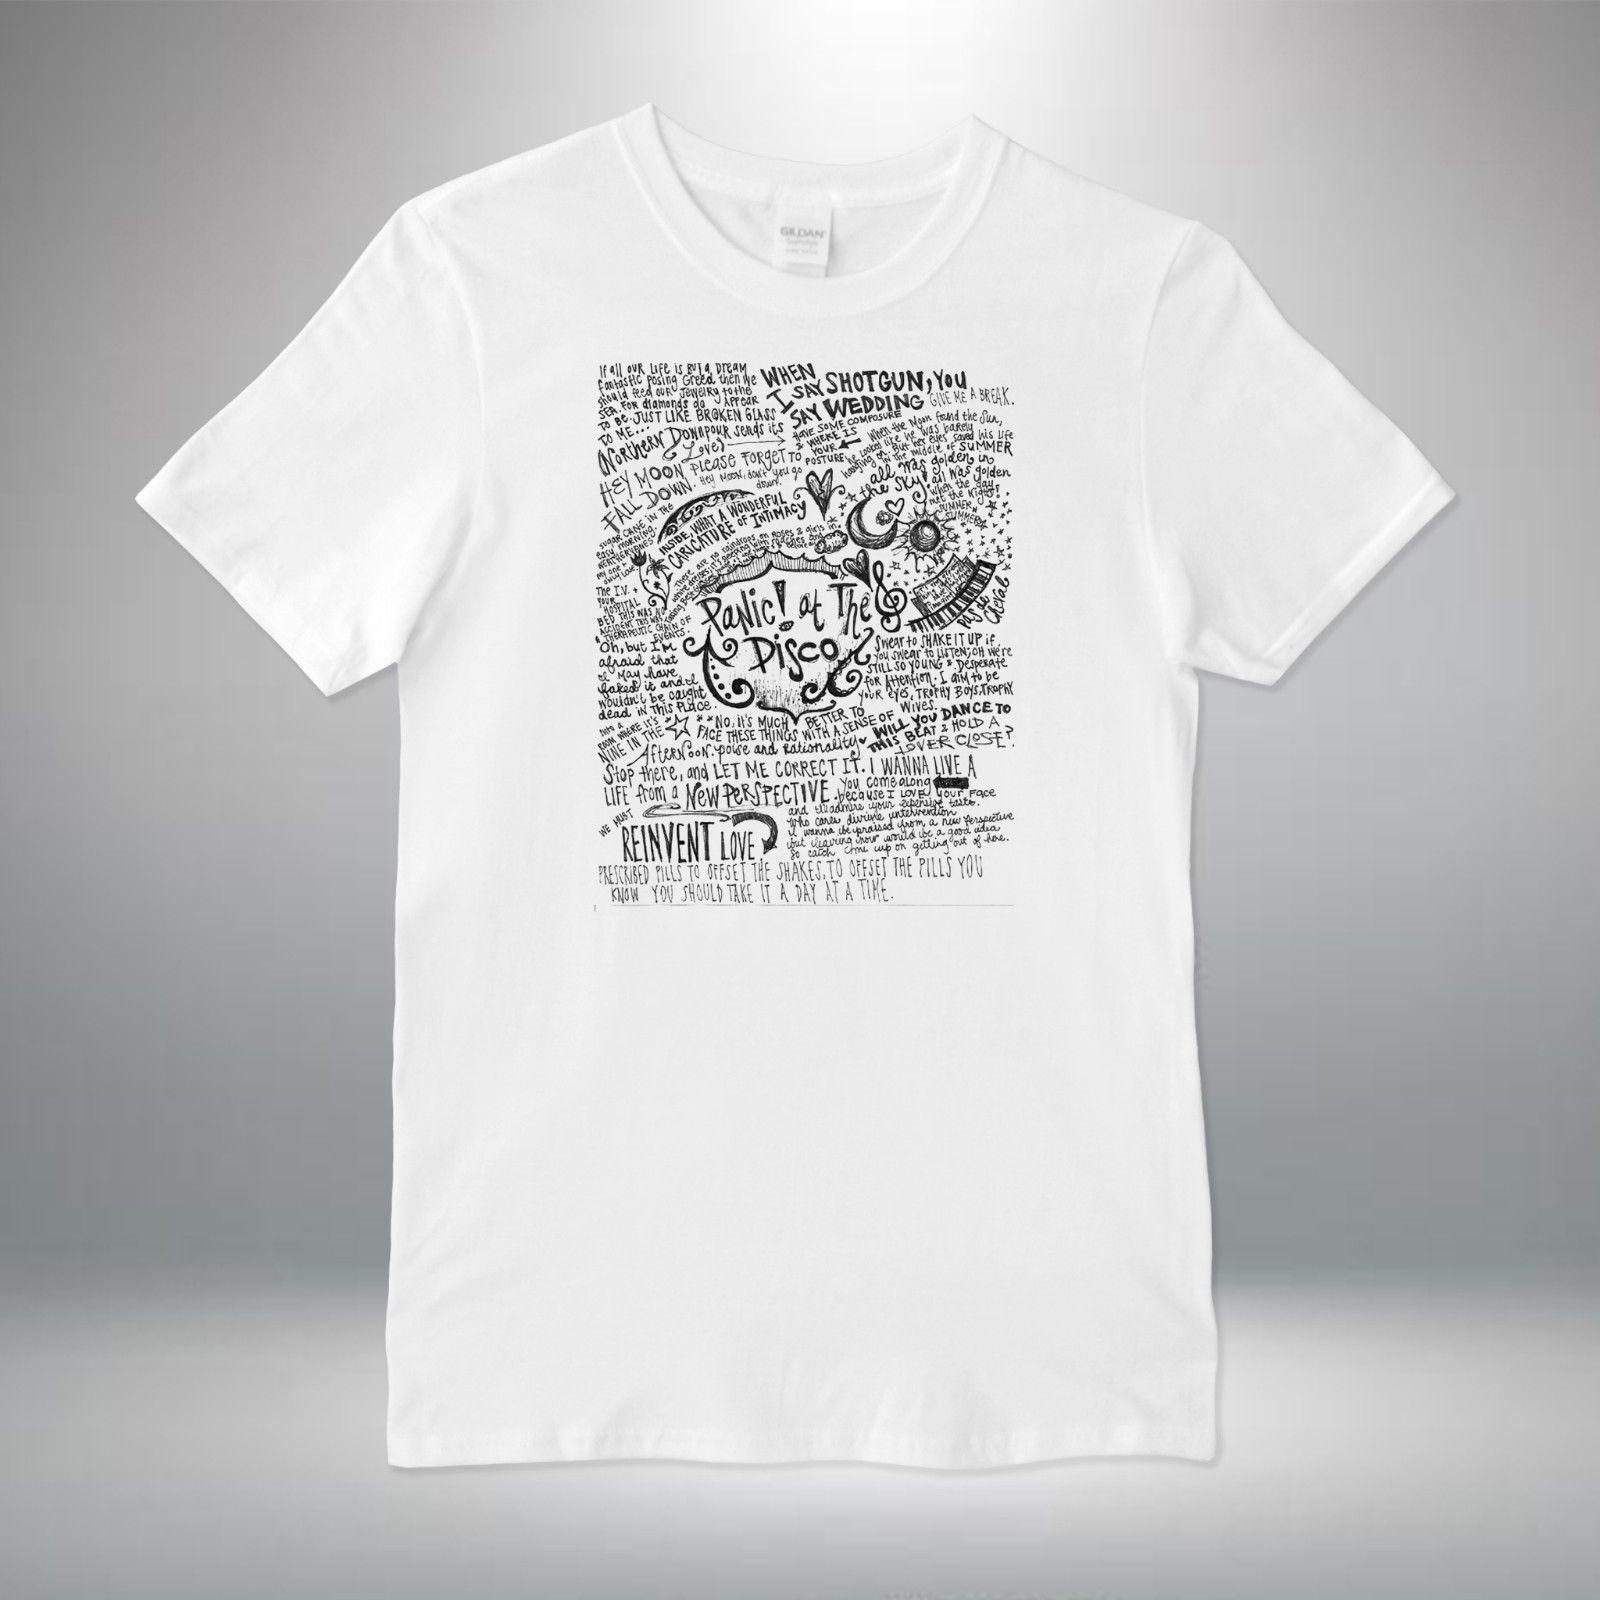 28e99904d Panic At The Disco Rock Band Lyrics Collage T-shirt Vest Top Men Unisex  Print T Shirt Men Harajuku Top Tee PLUS SIZE